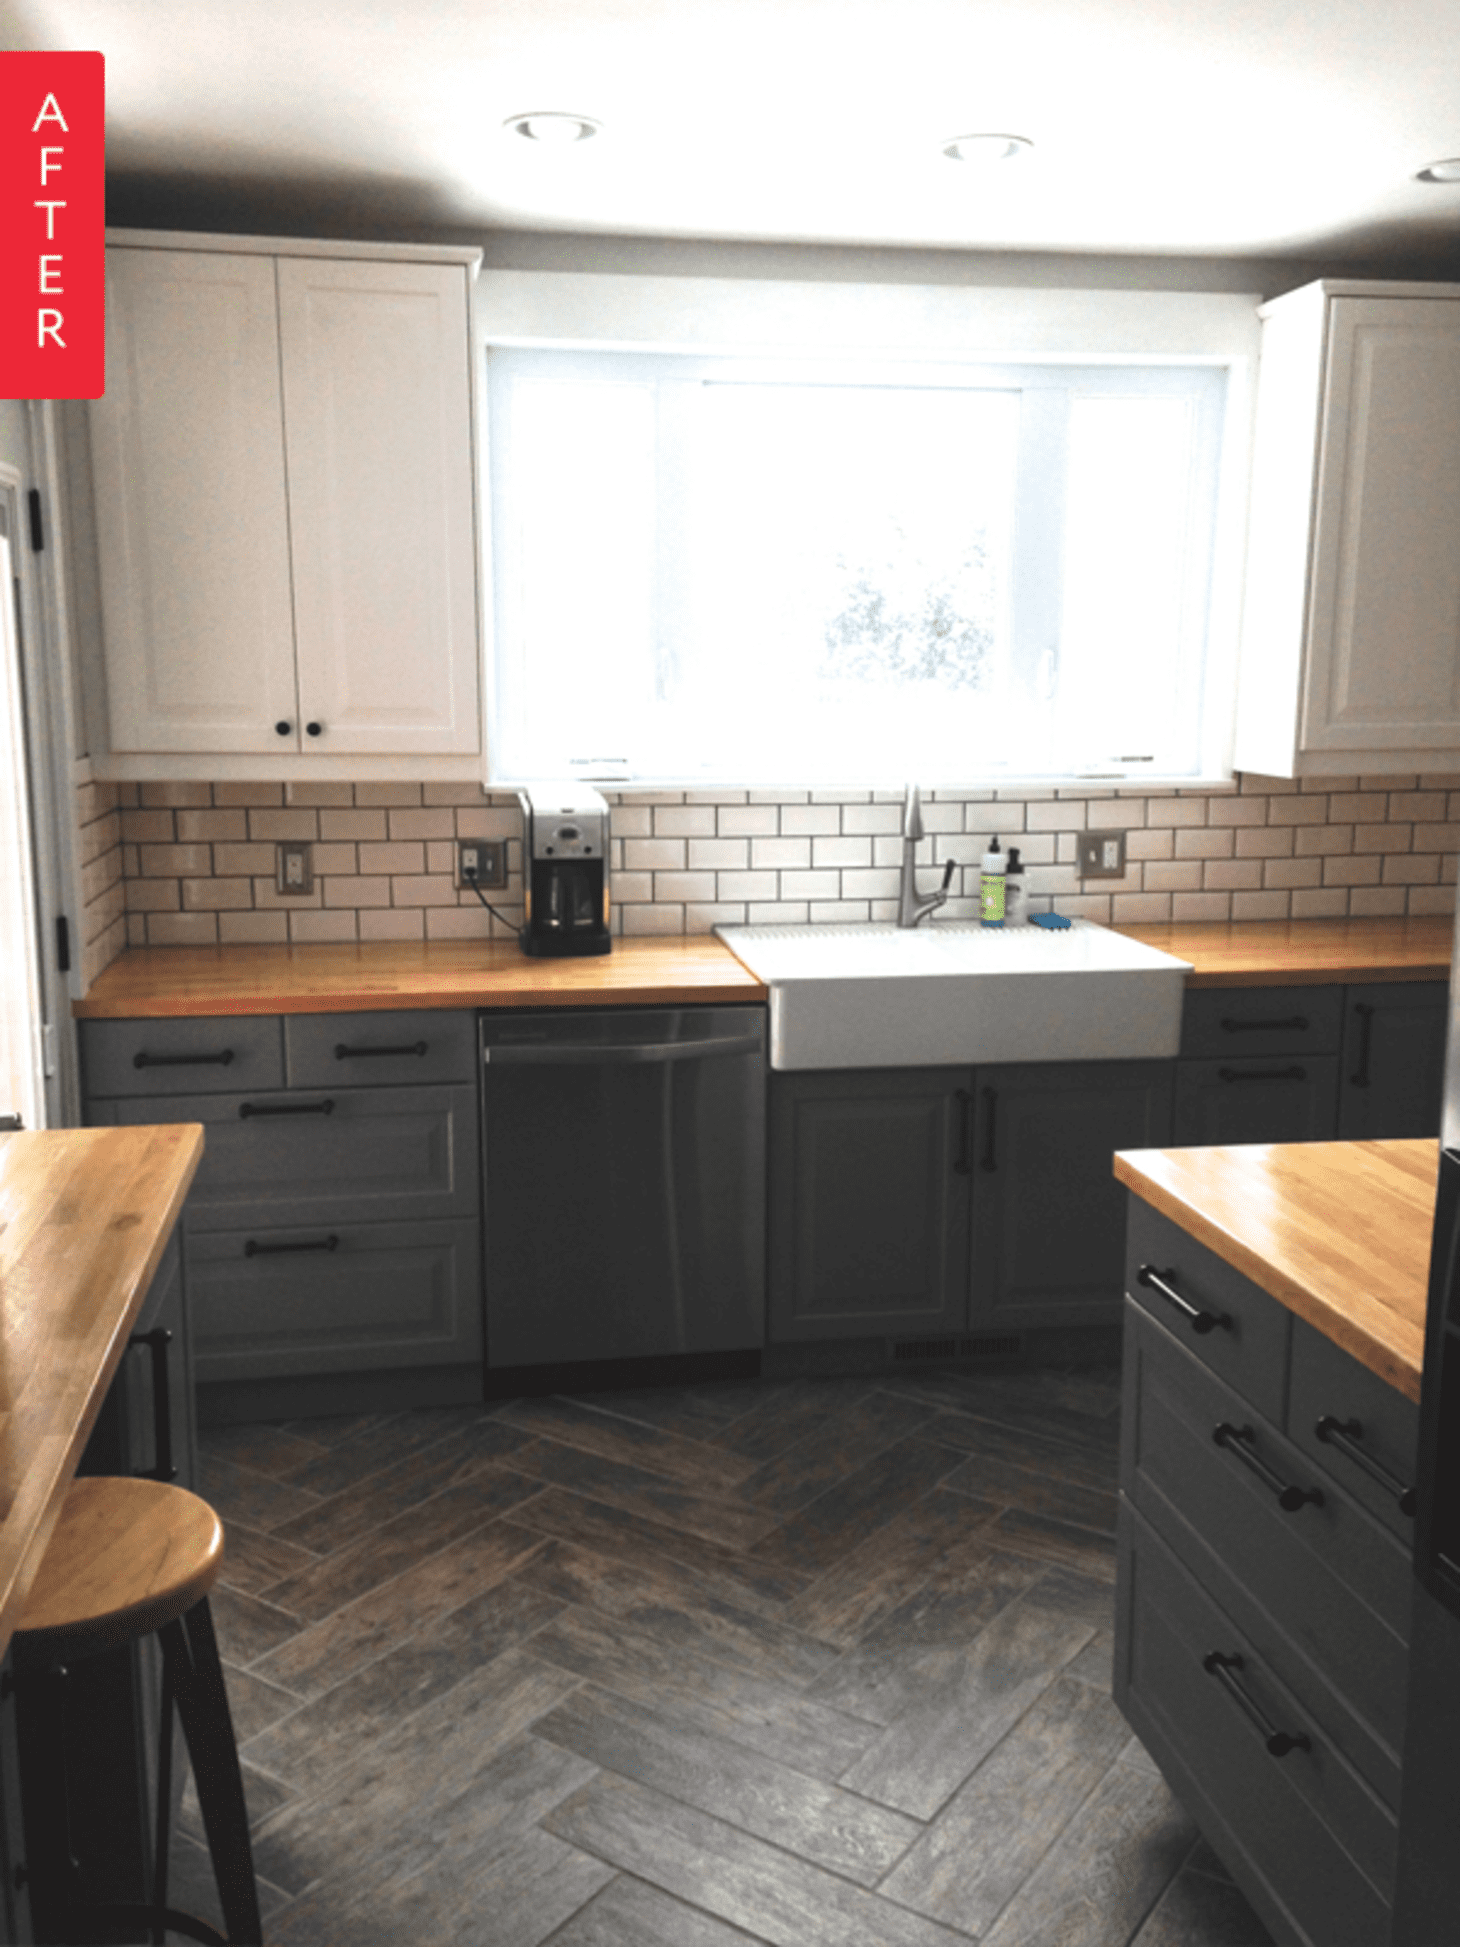 Apt Kitchen Renovations: Most Popular Budget Kitchen Renovation On Pinterest